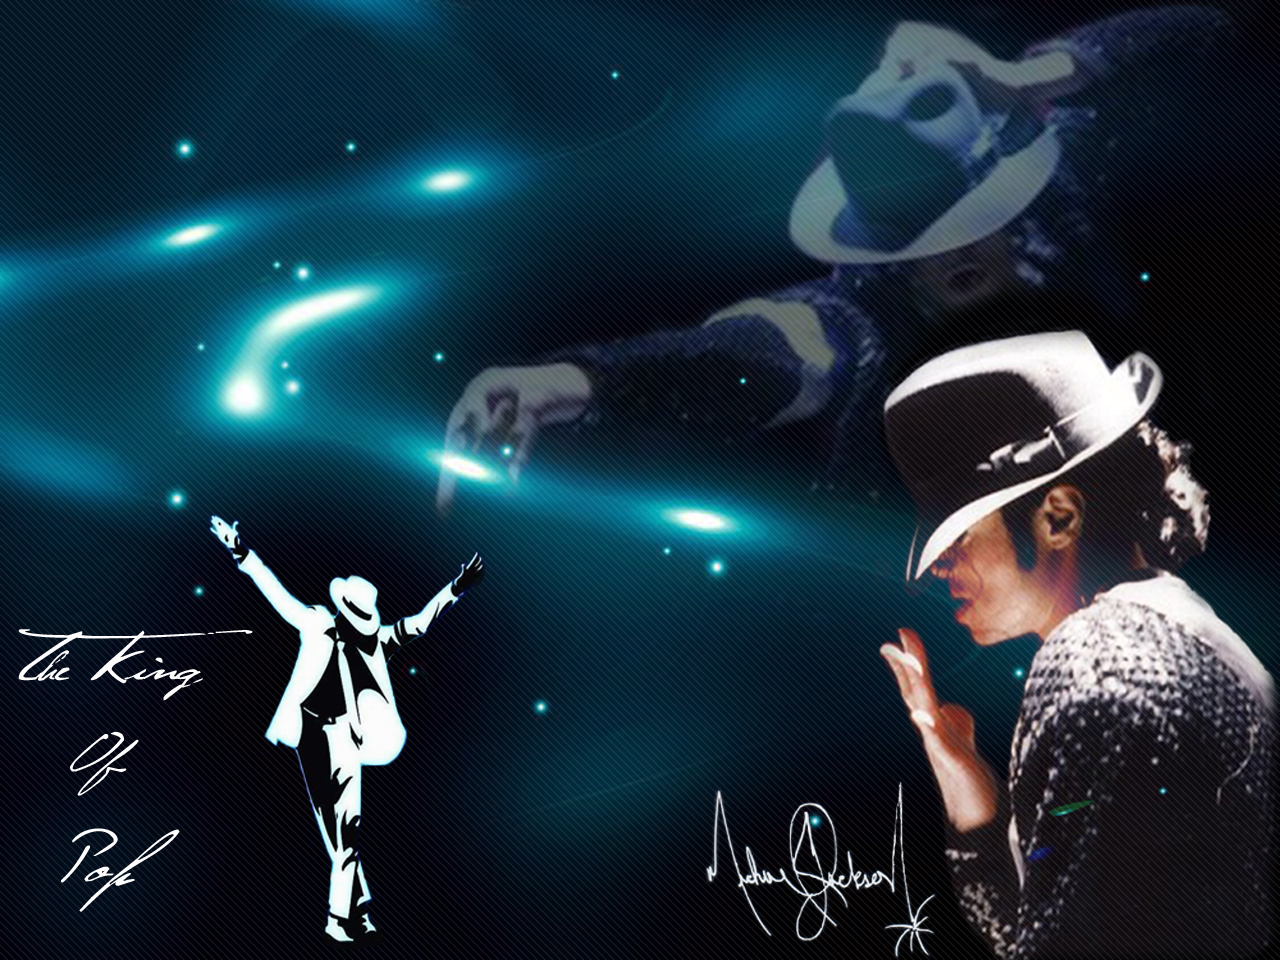 Michael Jackson Wallpaper By 92cy On Deviantart